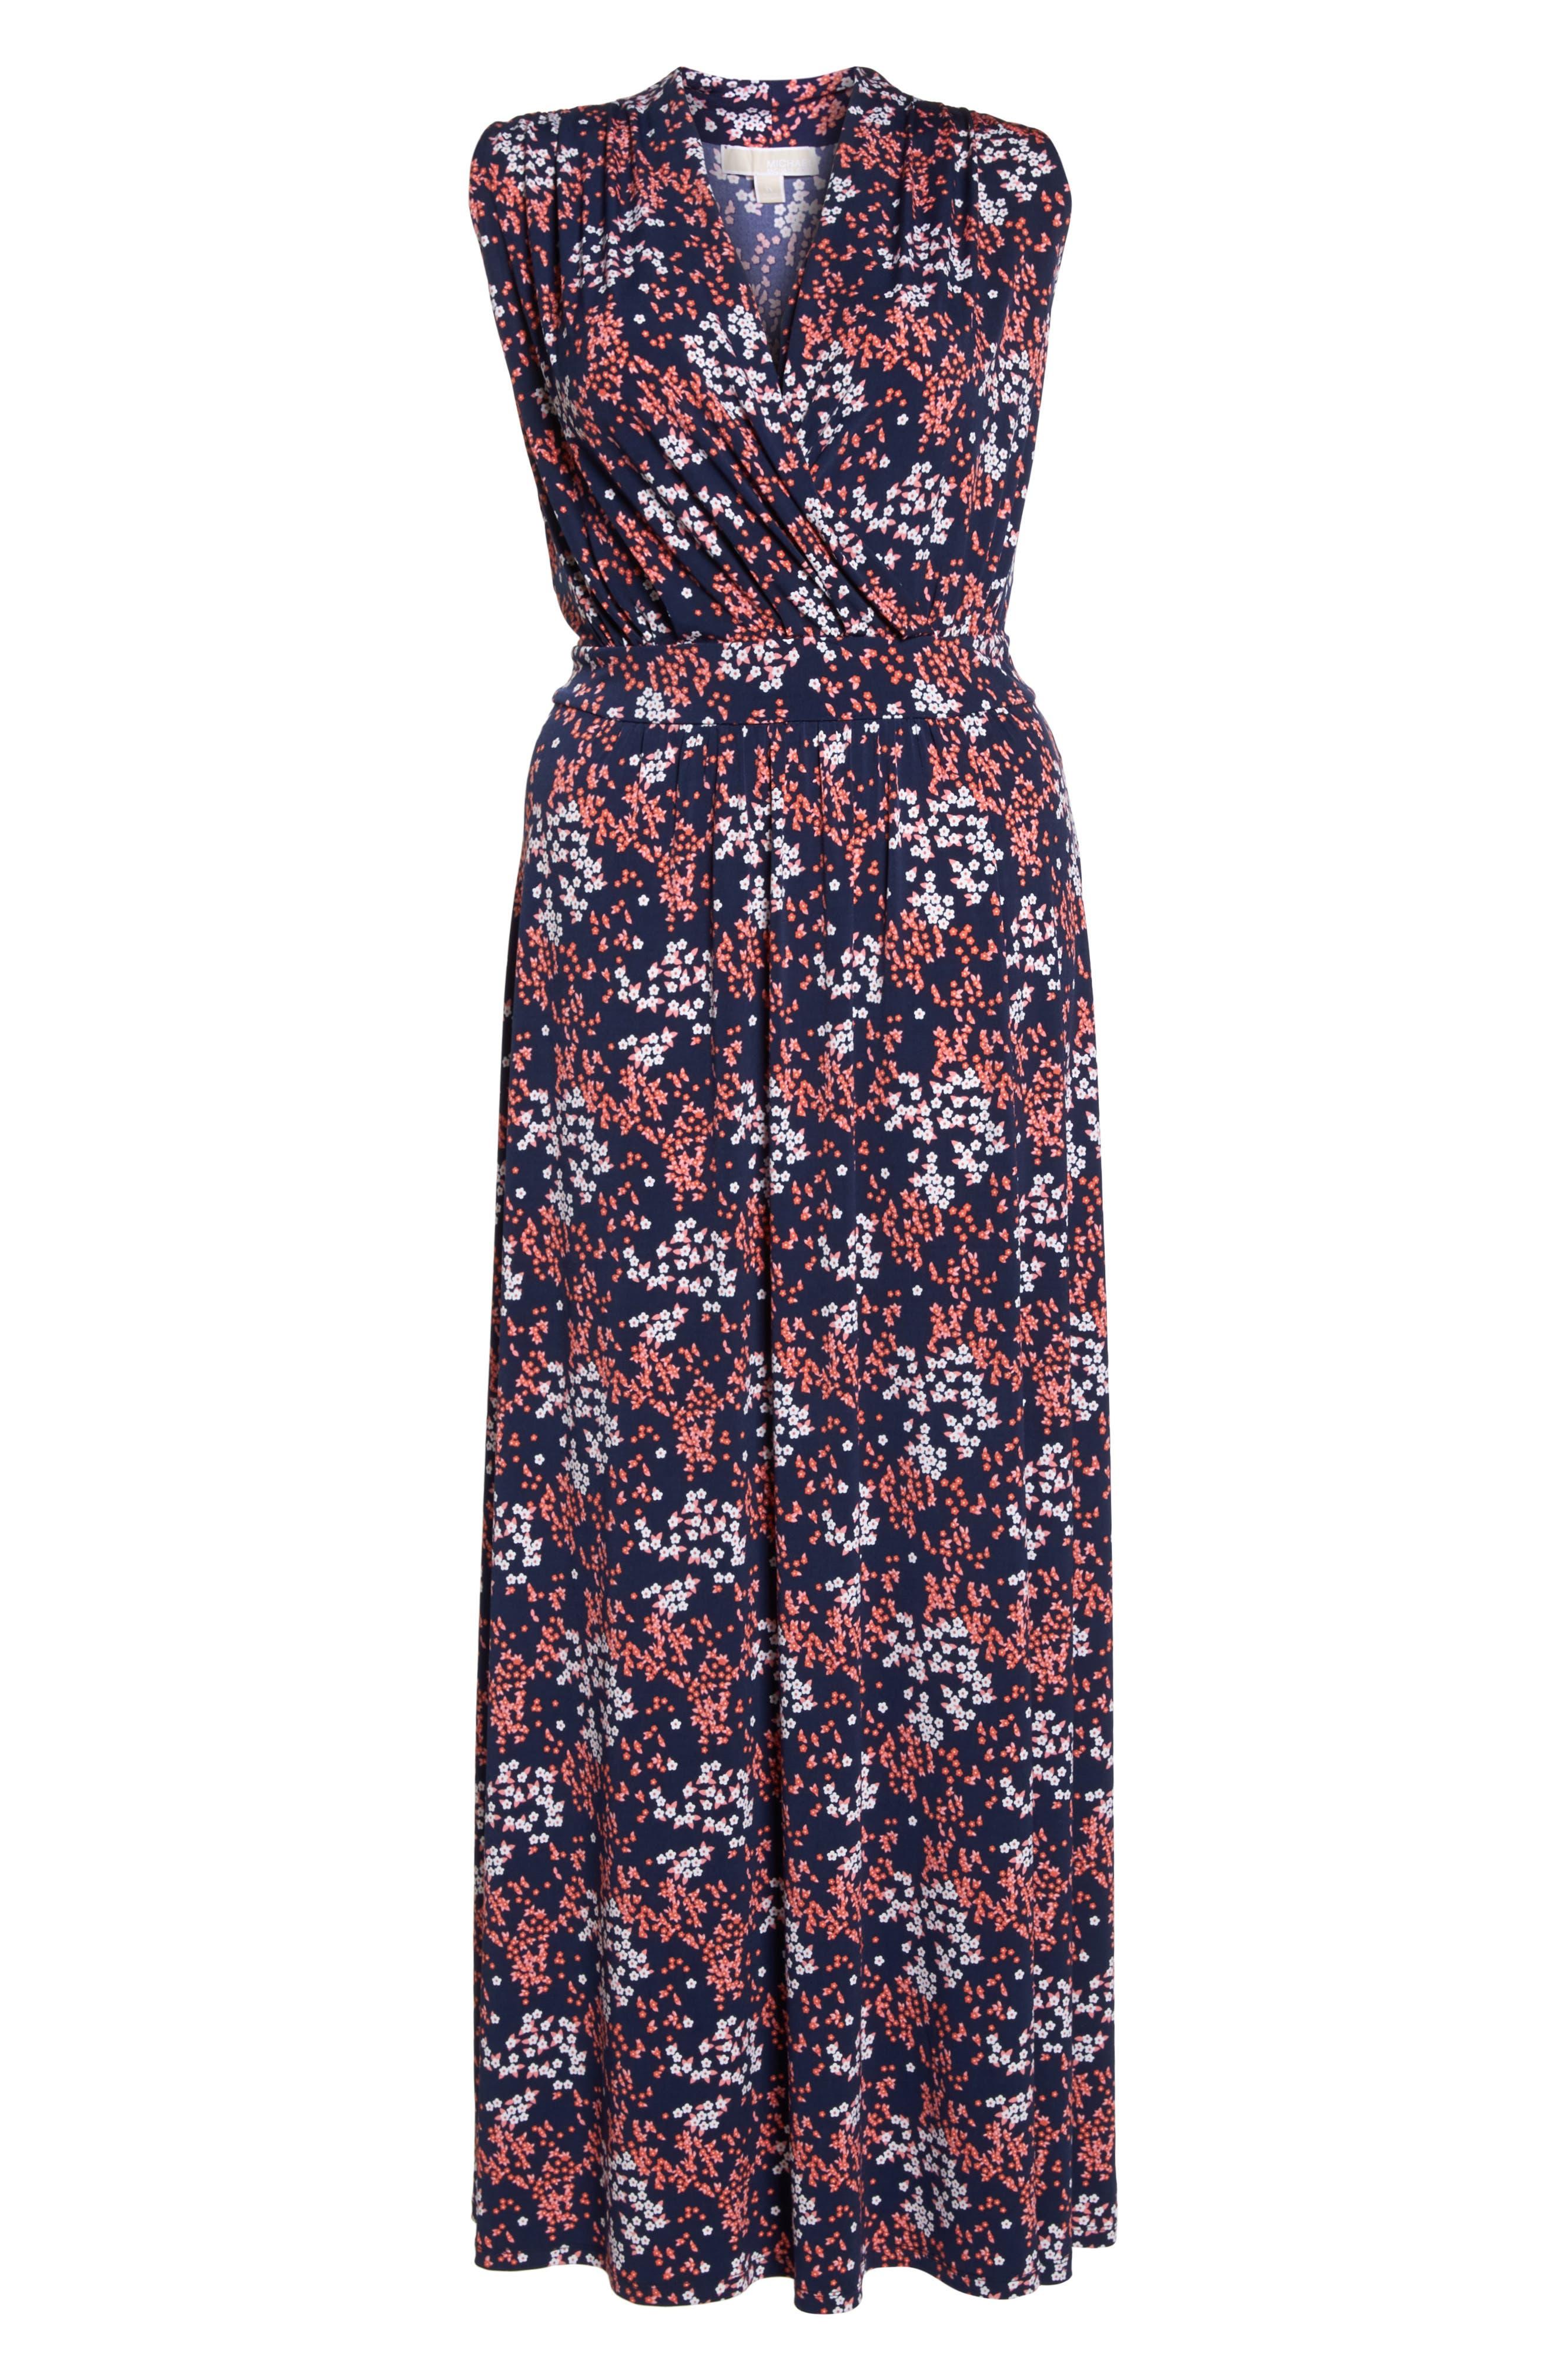 Floral Print Maxi Dress,                             Alternate thumbnail 7, color,